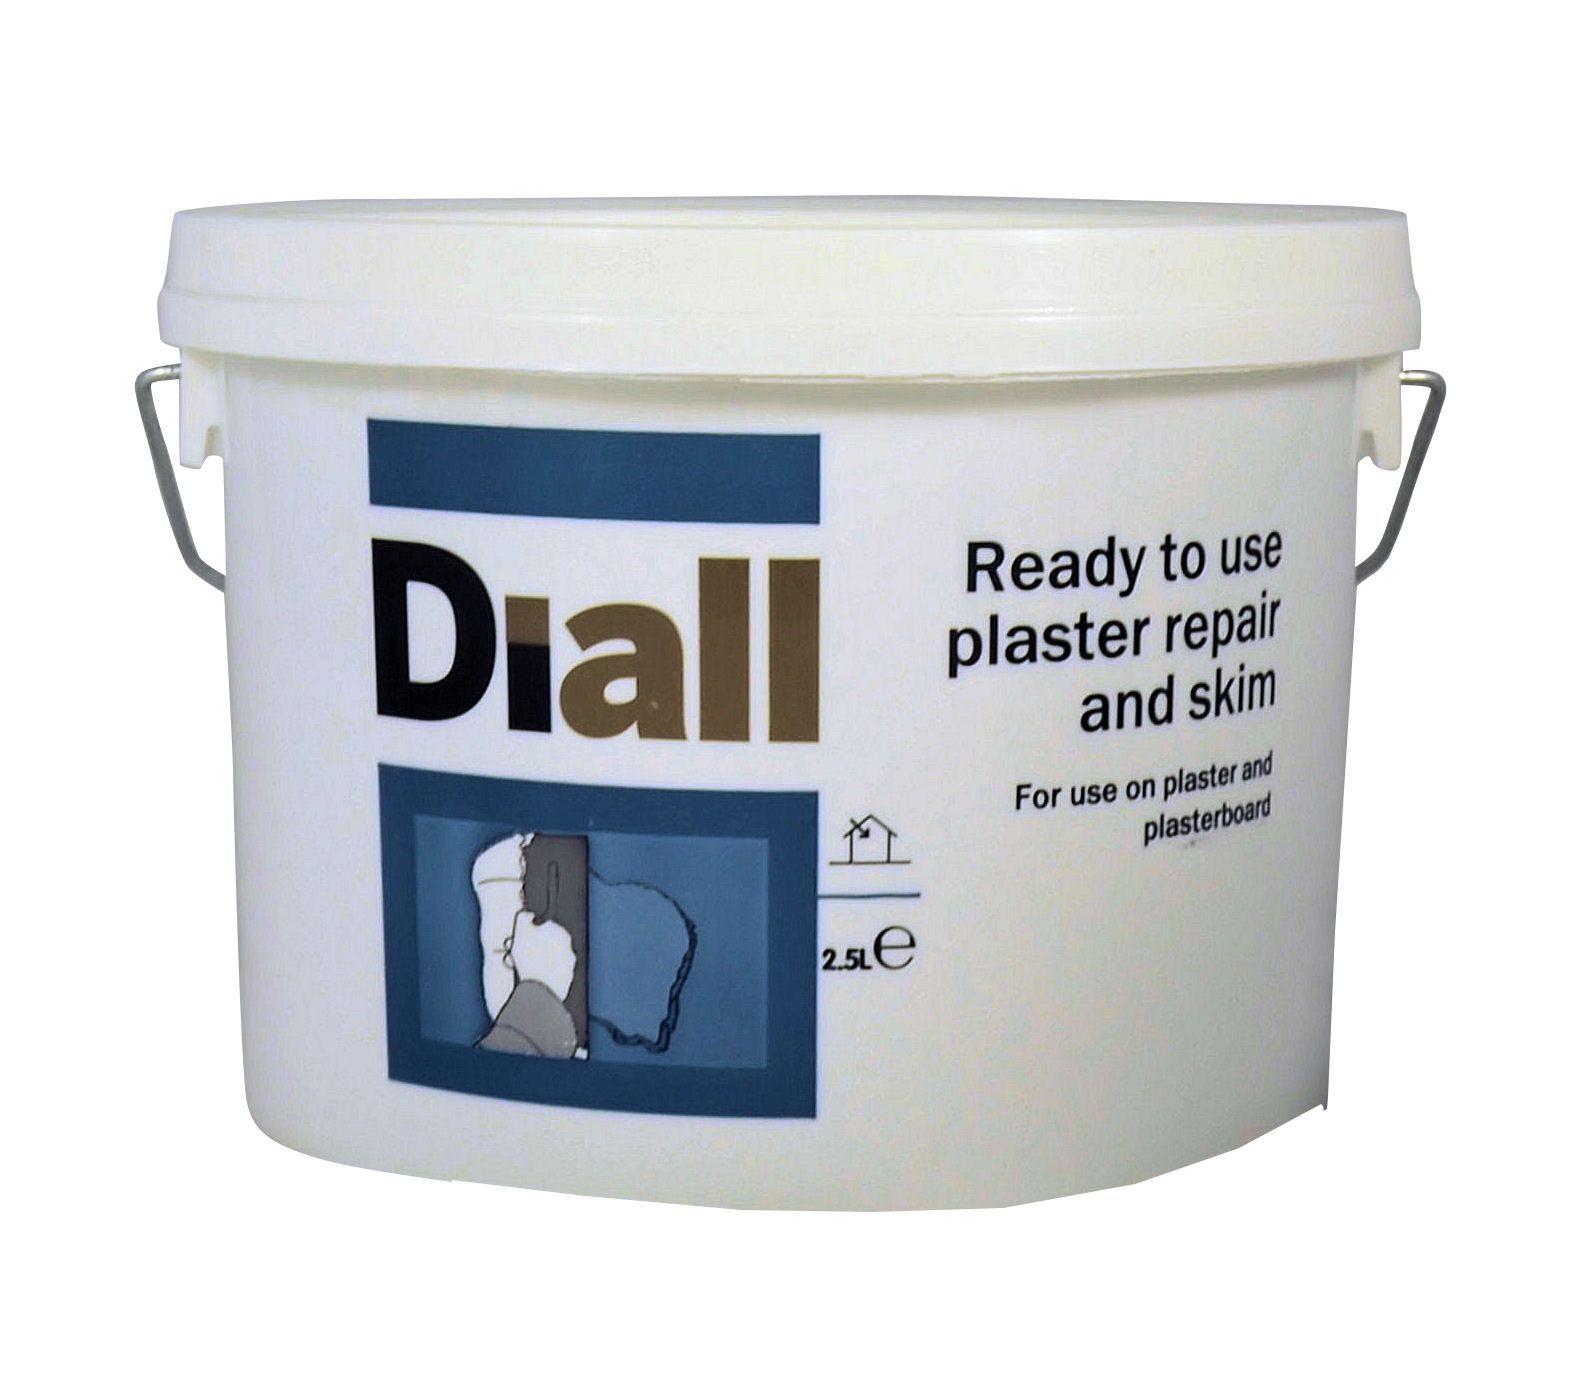 B Q Internal Plaster Repair  Artex Easifix Smooth It Texture Smoothing Kit 7 5L   Departments  . Artex Easifix Exterior Render Repair Kit Reviews. Home Design Ideas